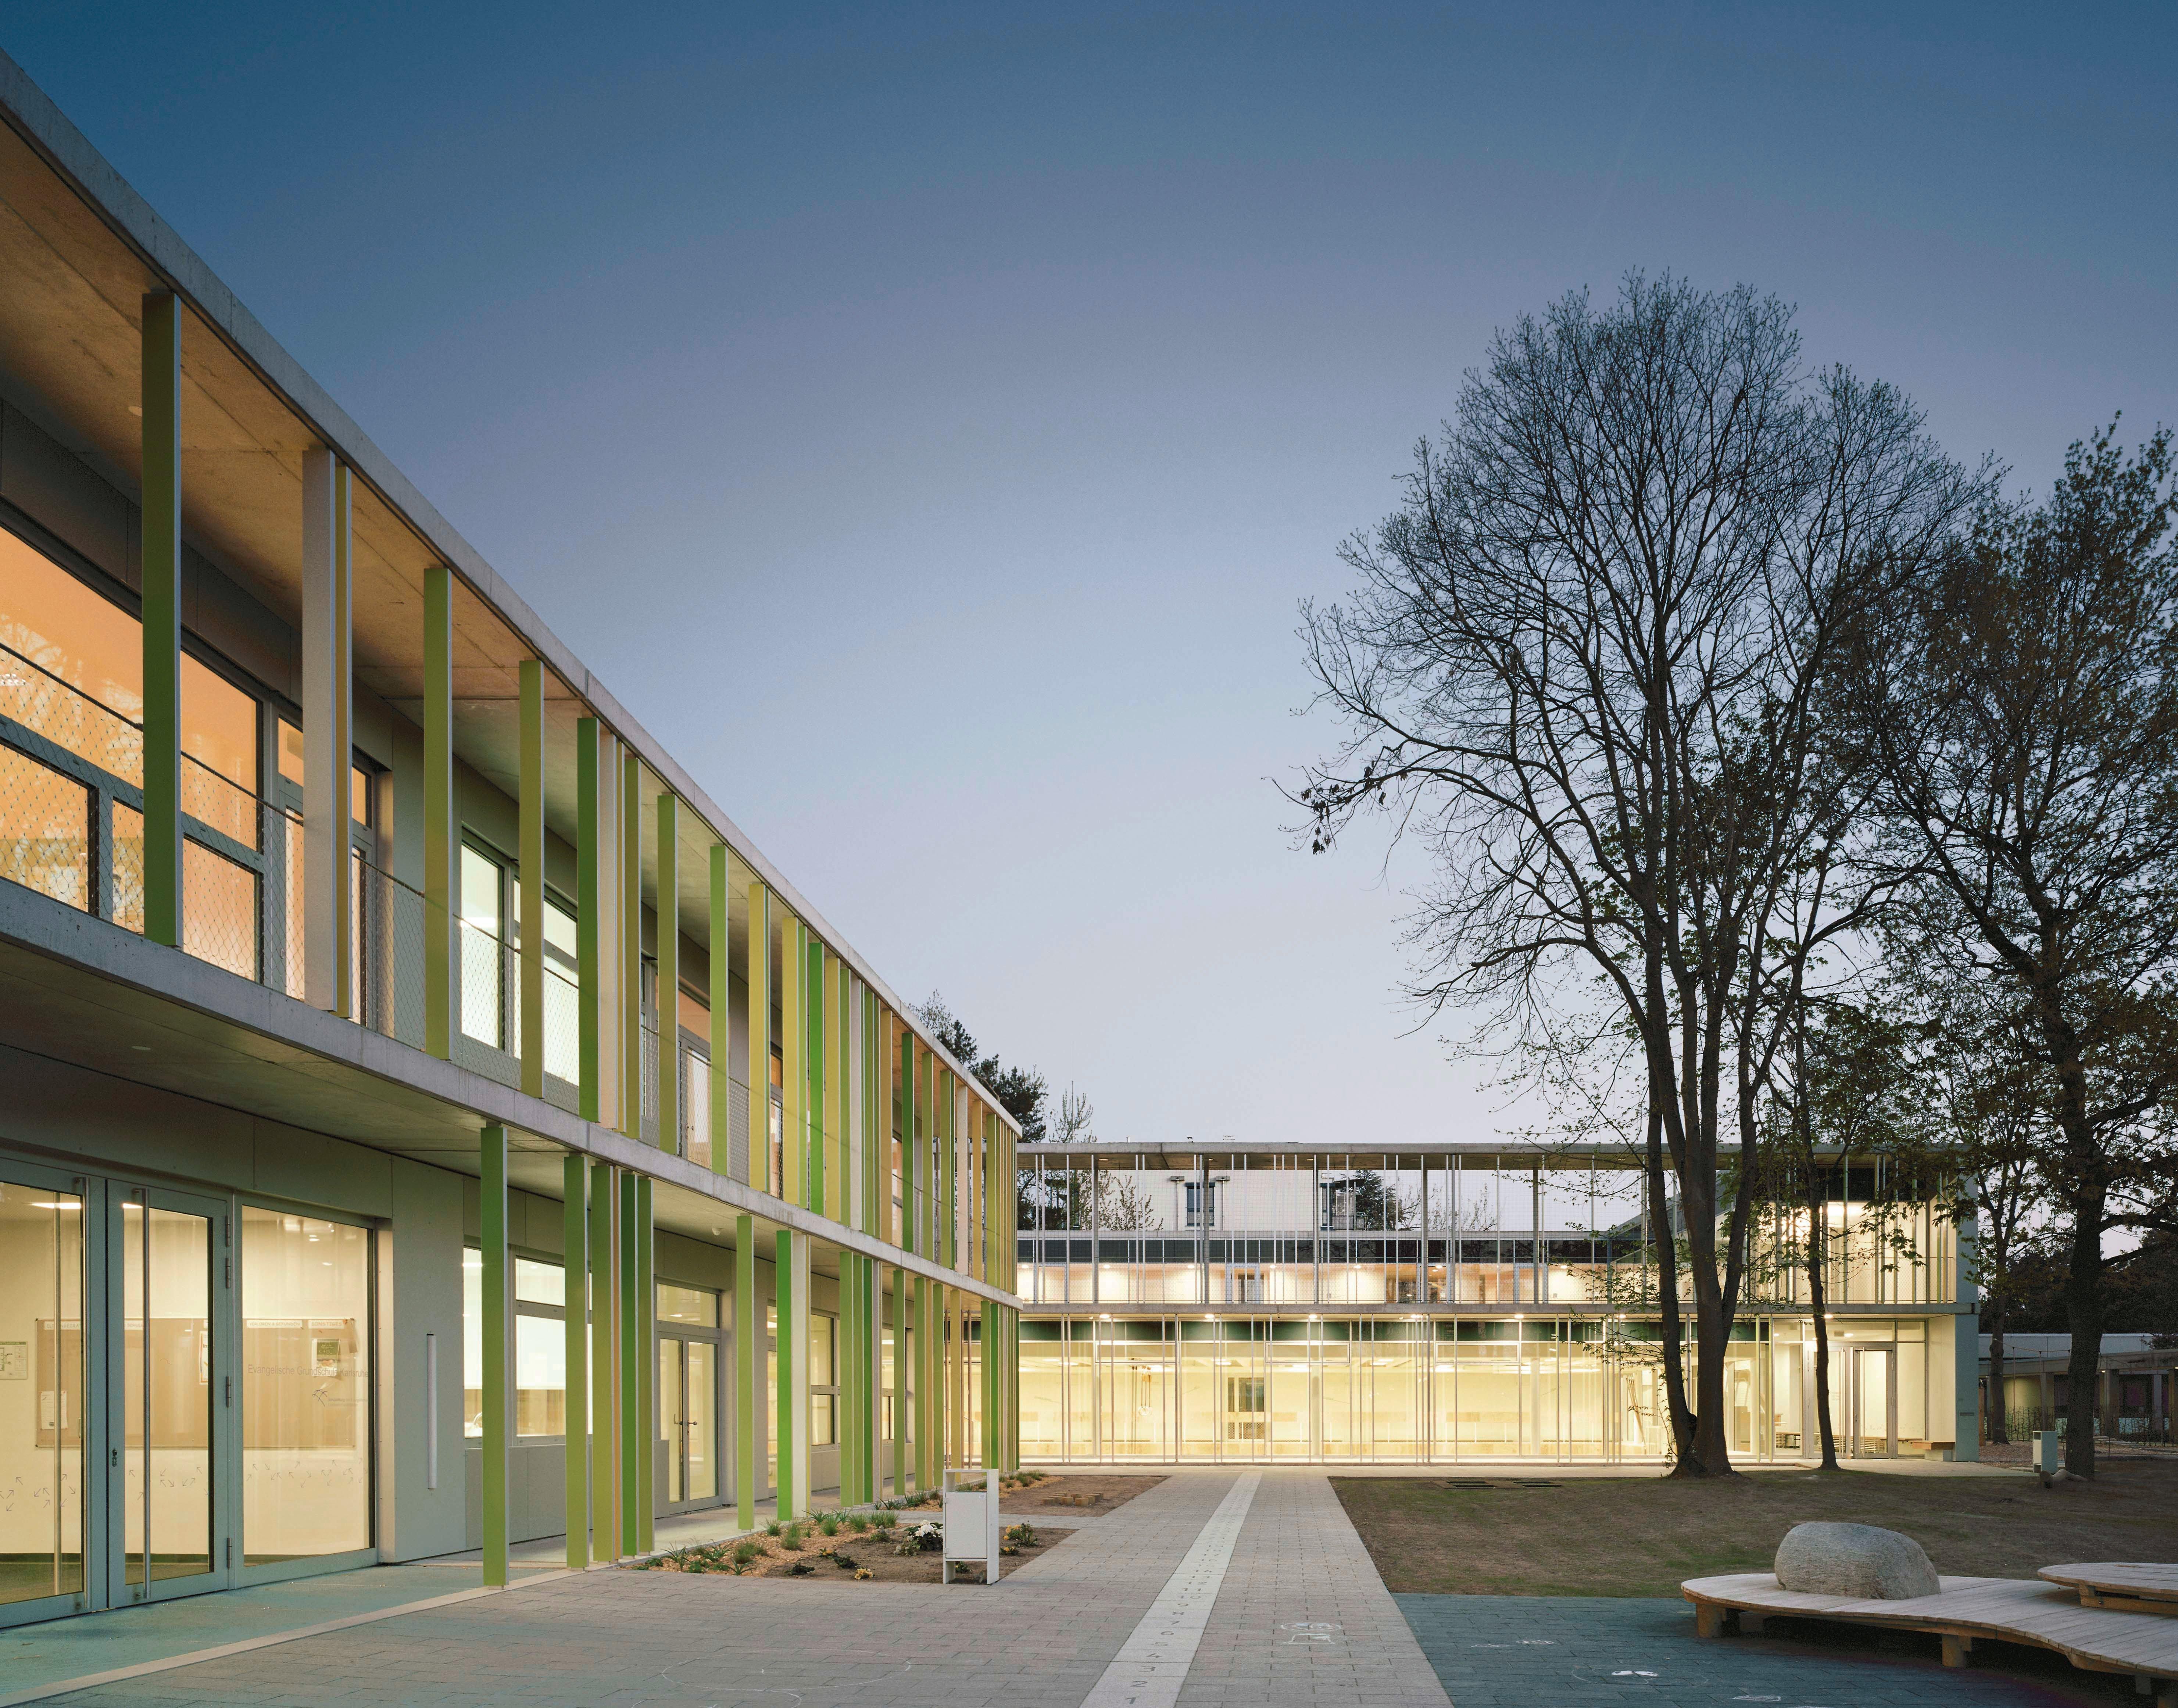 Protestant elementary school Karlsruhe